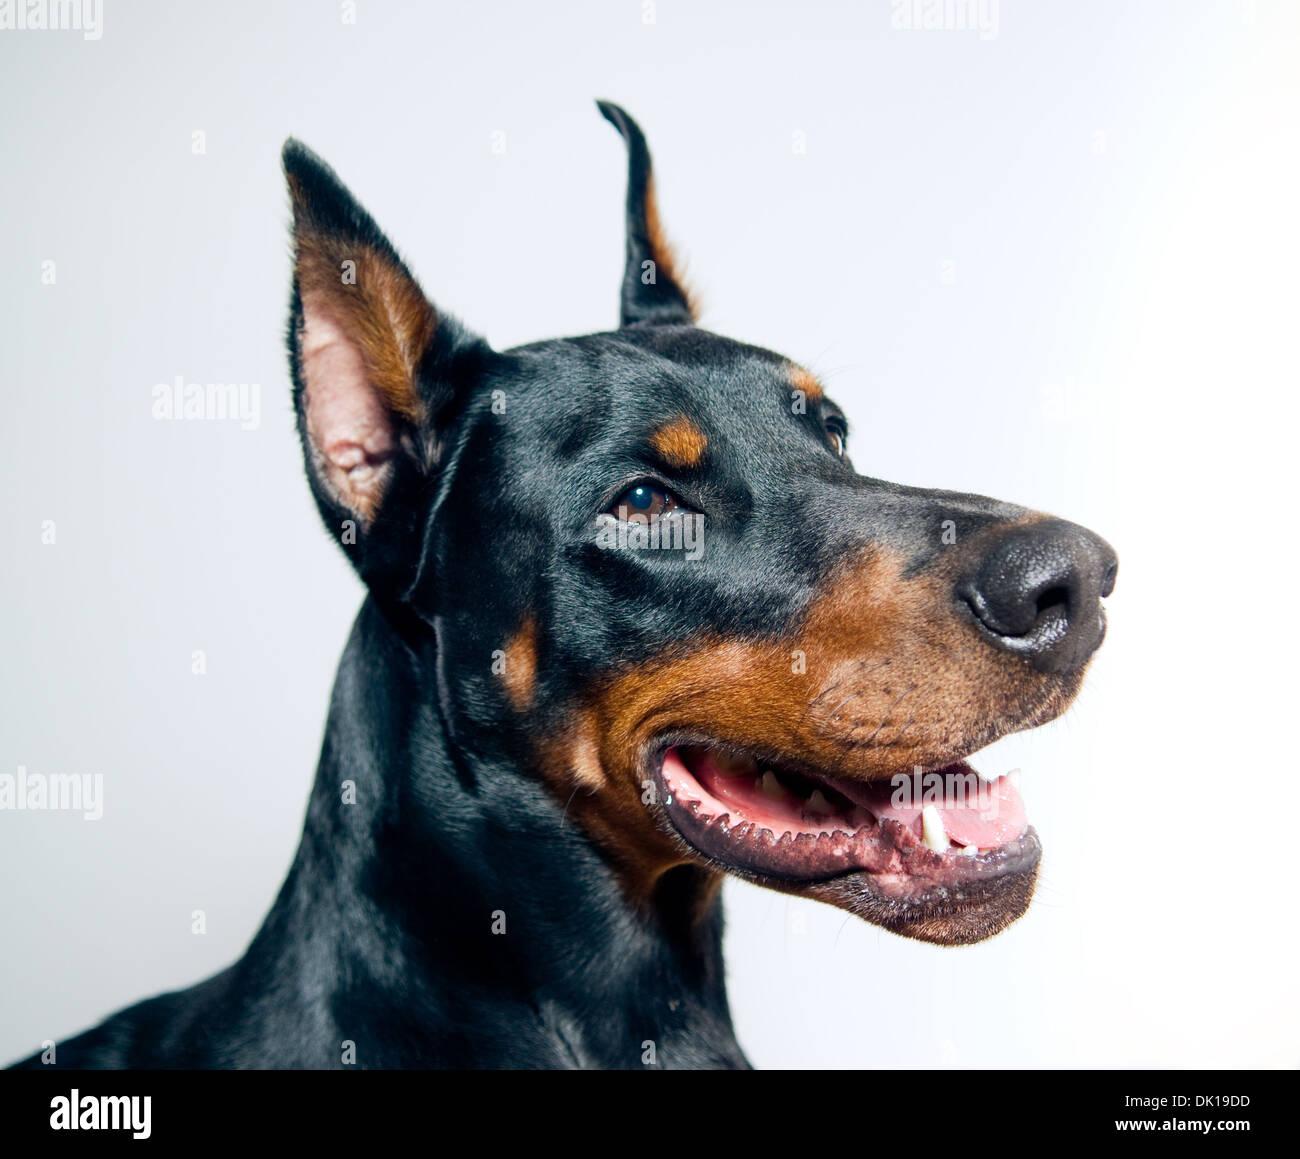 Doberman Pinscher portrait on simple background - Stock Image